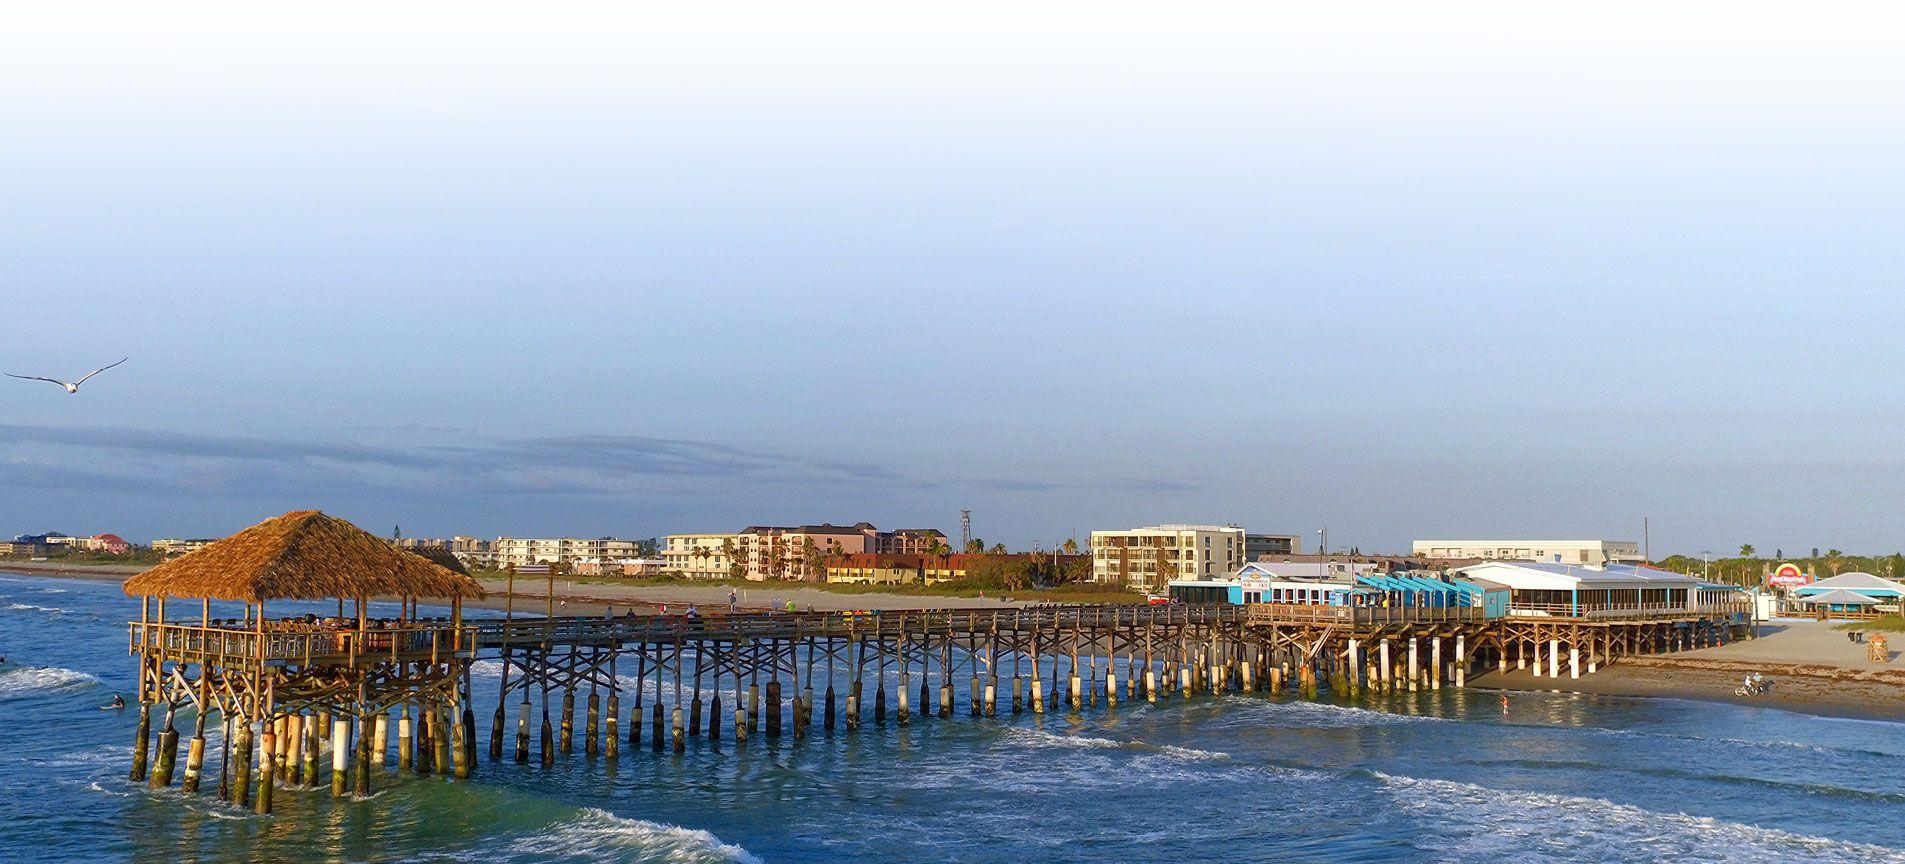 Www Cocoabeachpier Com Cbp Restaurants Bars On The Cocoa Beach Pier Atlantic Ocean Grille Cocoa Beach Florida Coco Beach Florida Cocoa Beach